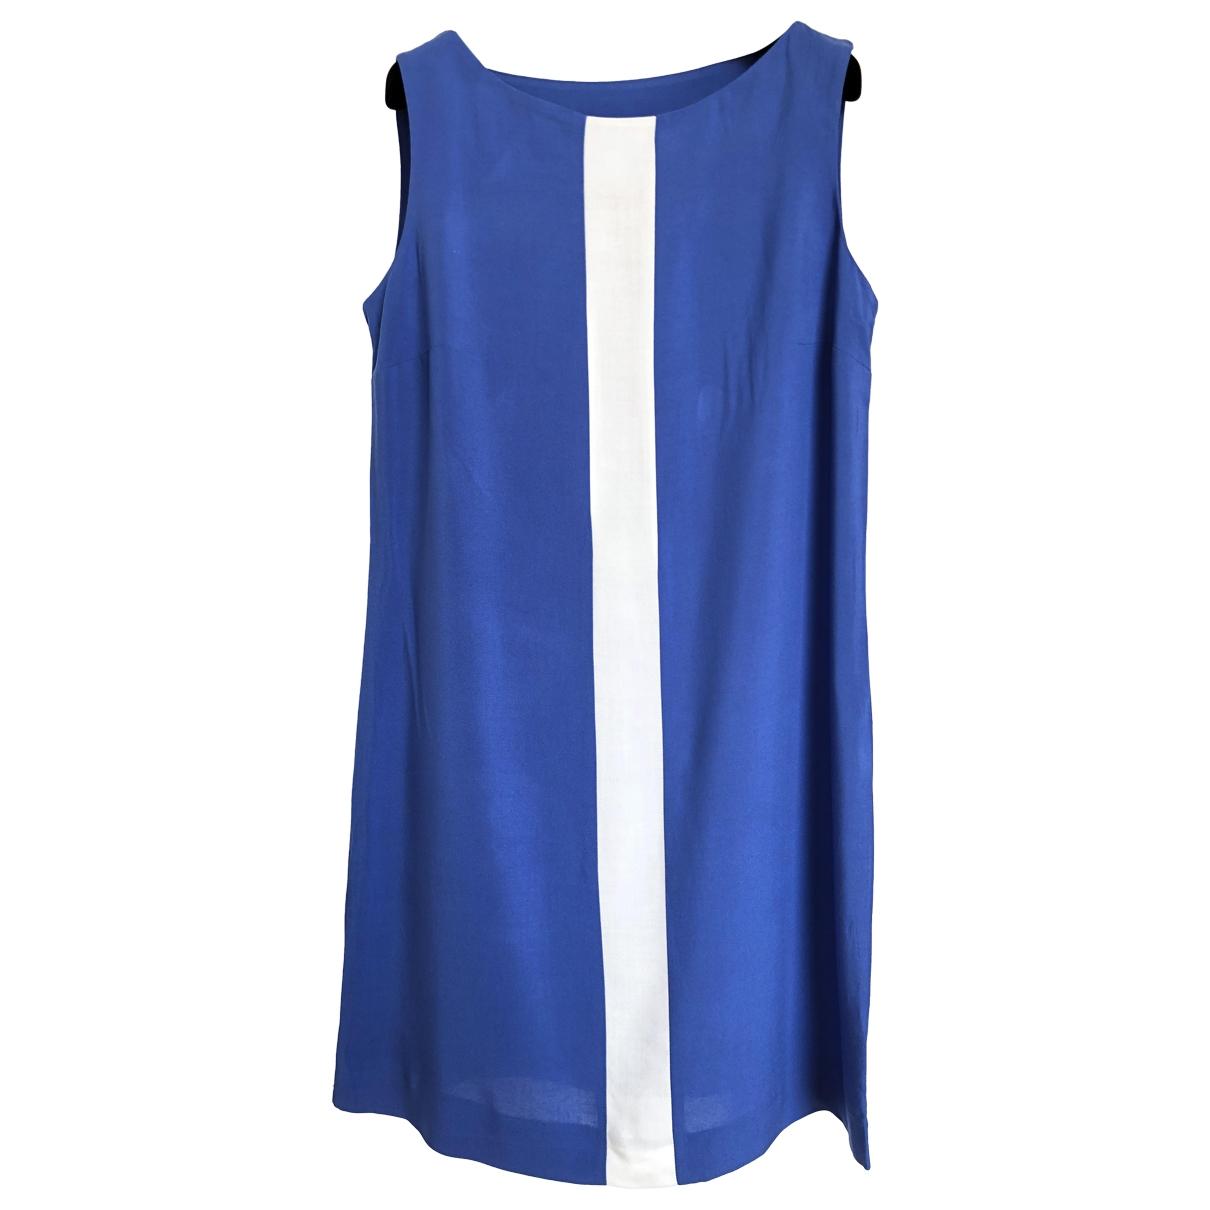 Mango \N Blue dress for Women S International